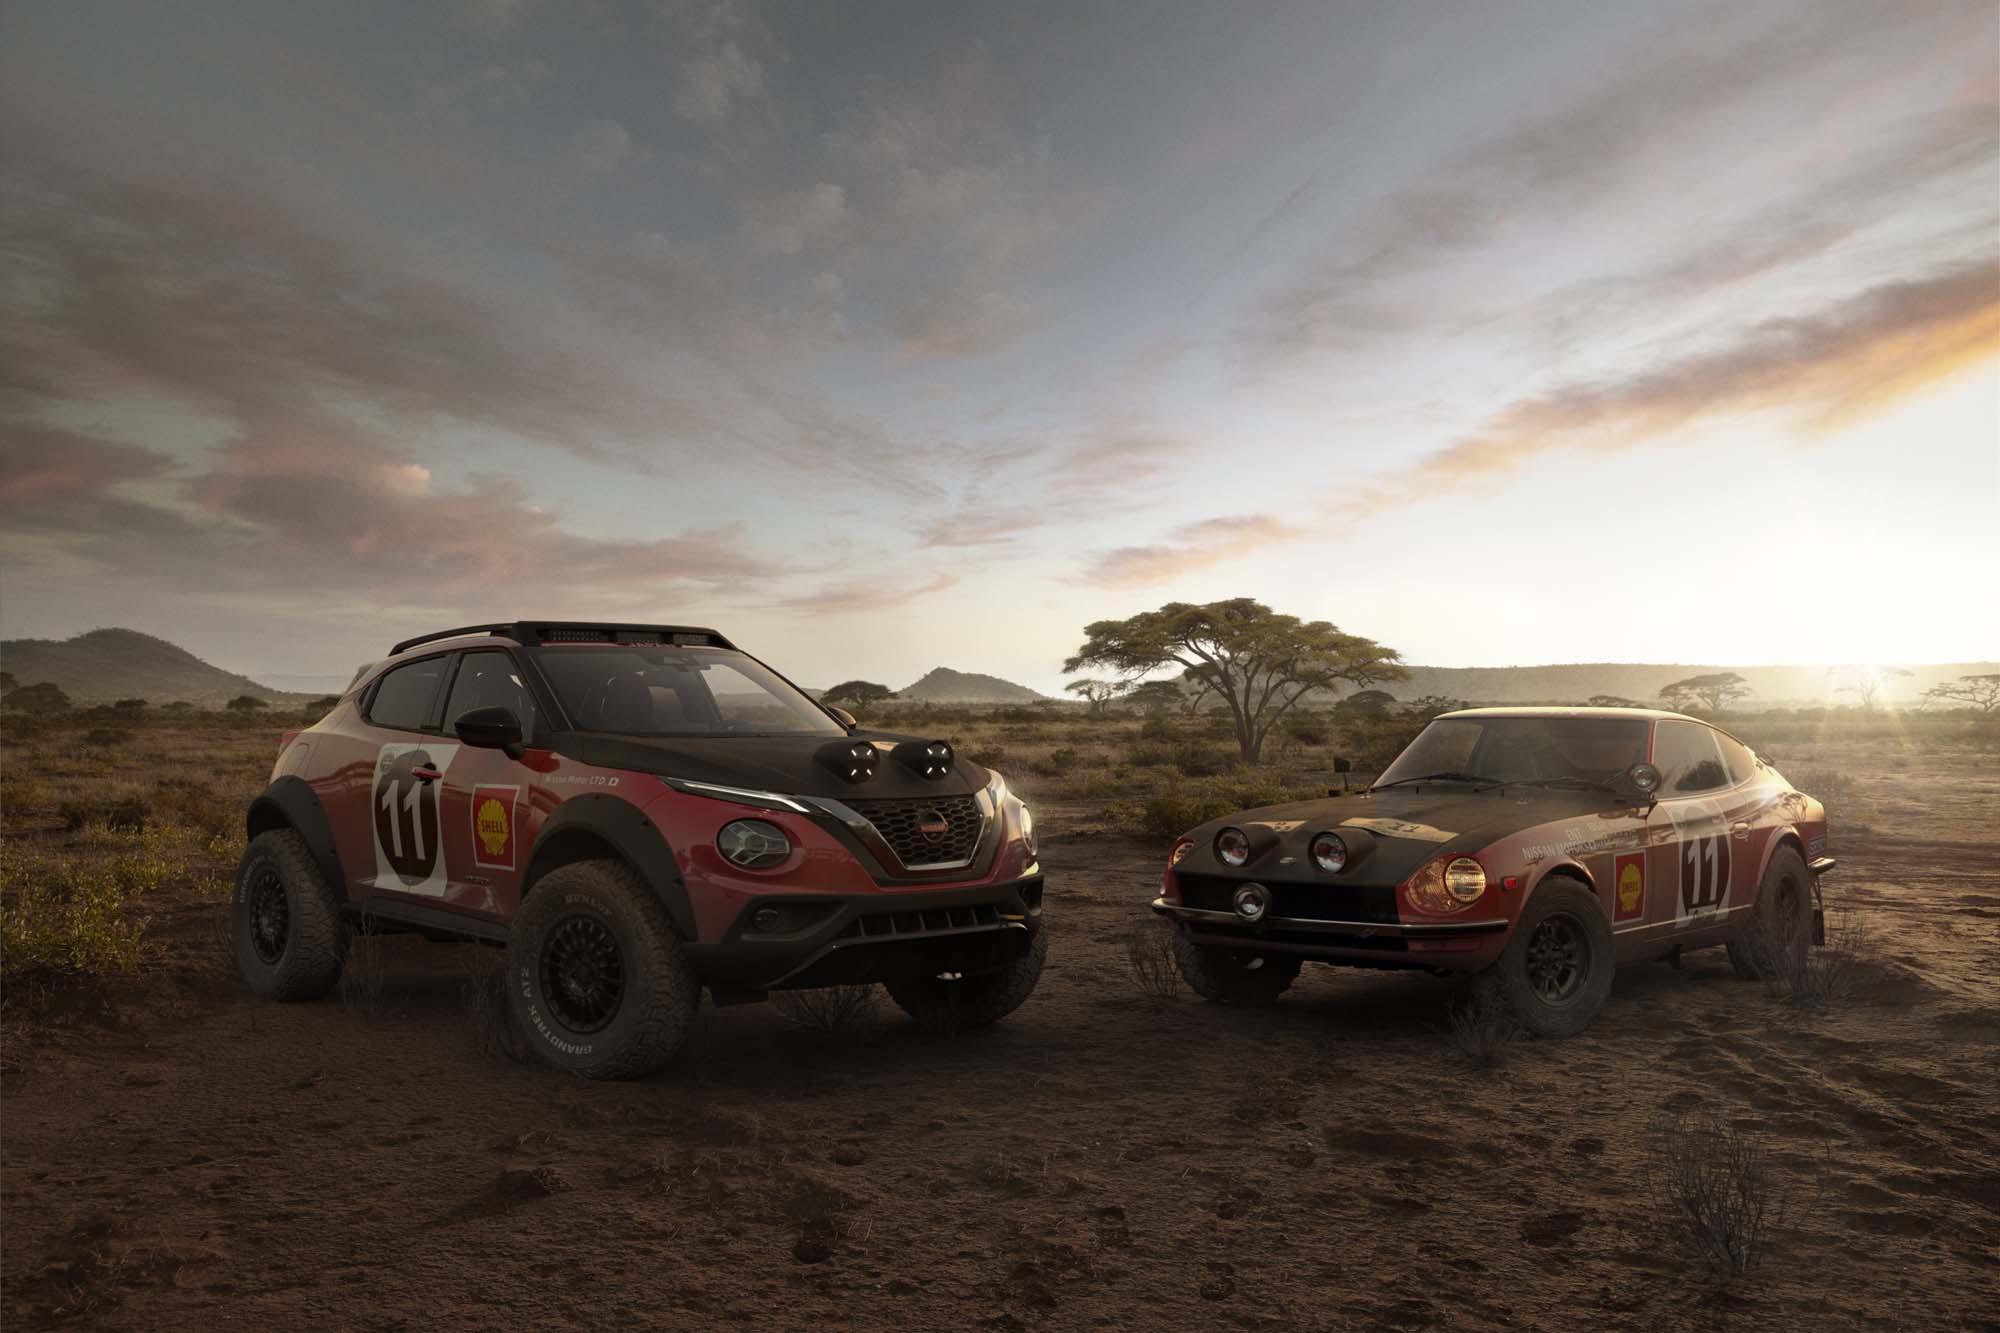 JUKE Rally Heritage Concept 5 Πώς σου φαίνεται αυτό το Nissan Juke Rally; Nissan, Nissan Juke, zblog, ειδήσεις, Νέα